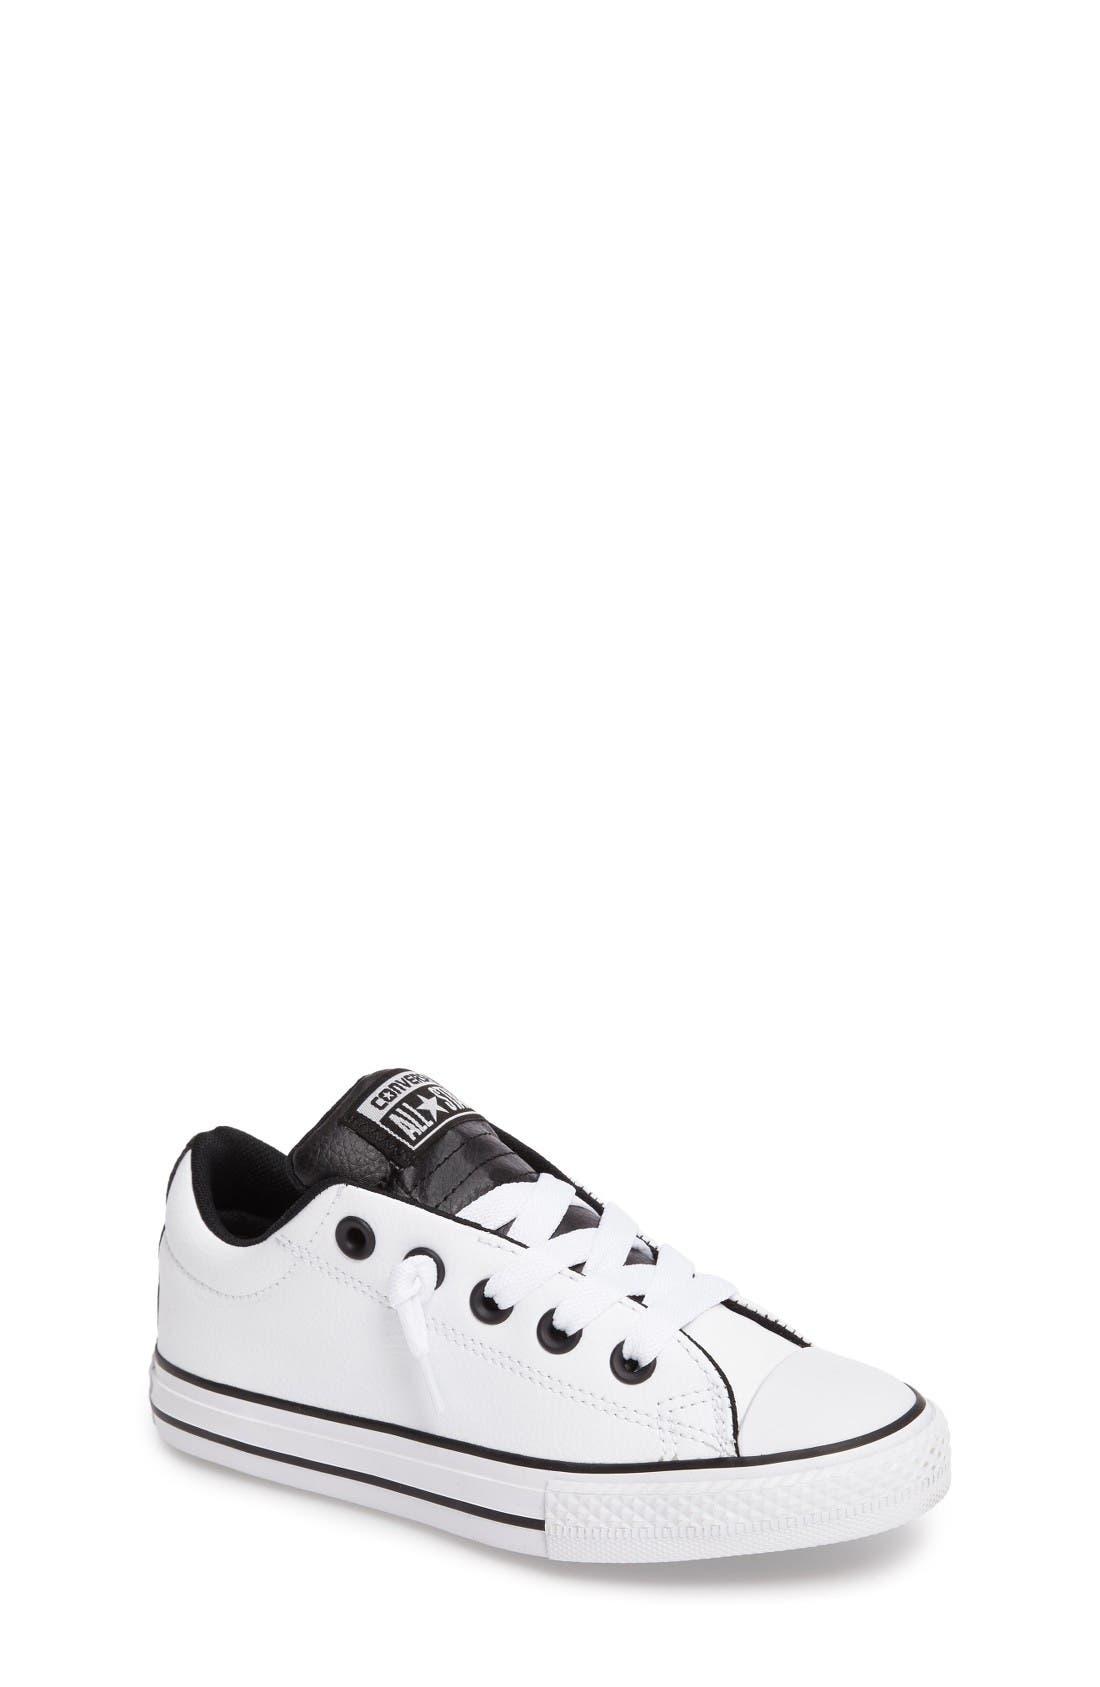 Converse Chuck Taylor® All Star® Street Sneaker (Toddler, Little Kid & Big Kid)